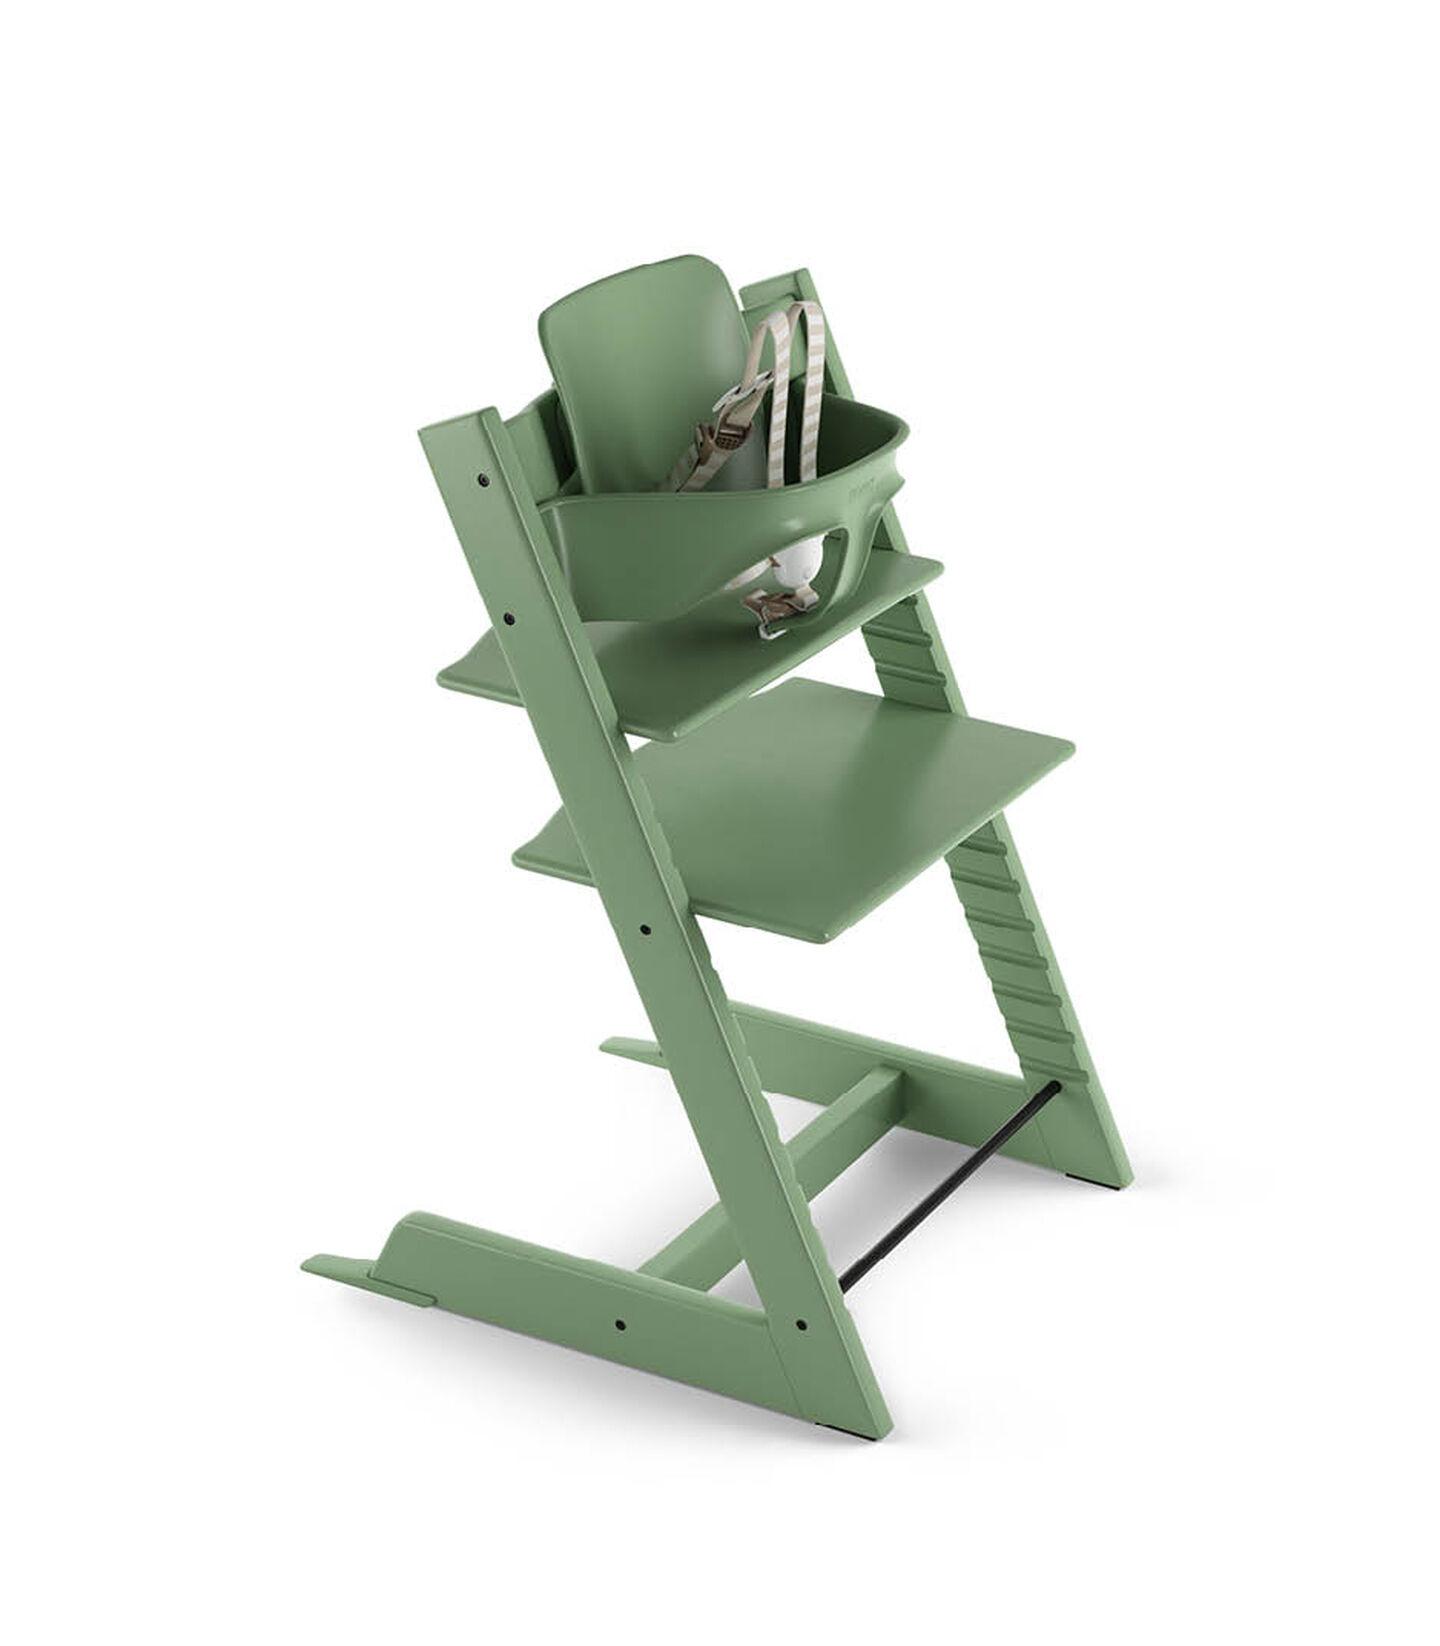 Tripp Trapp® Bundle High Chair US 18 Moss Green, Moss Green, mainview view 2